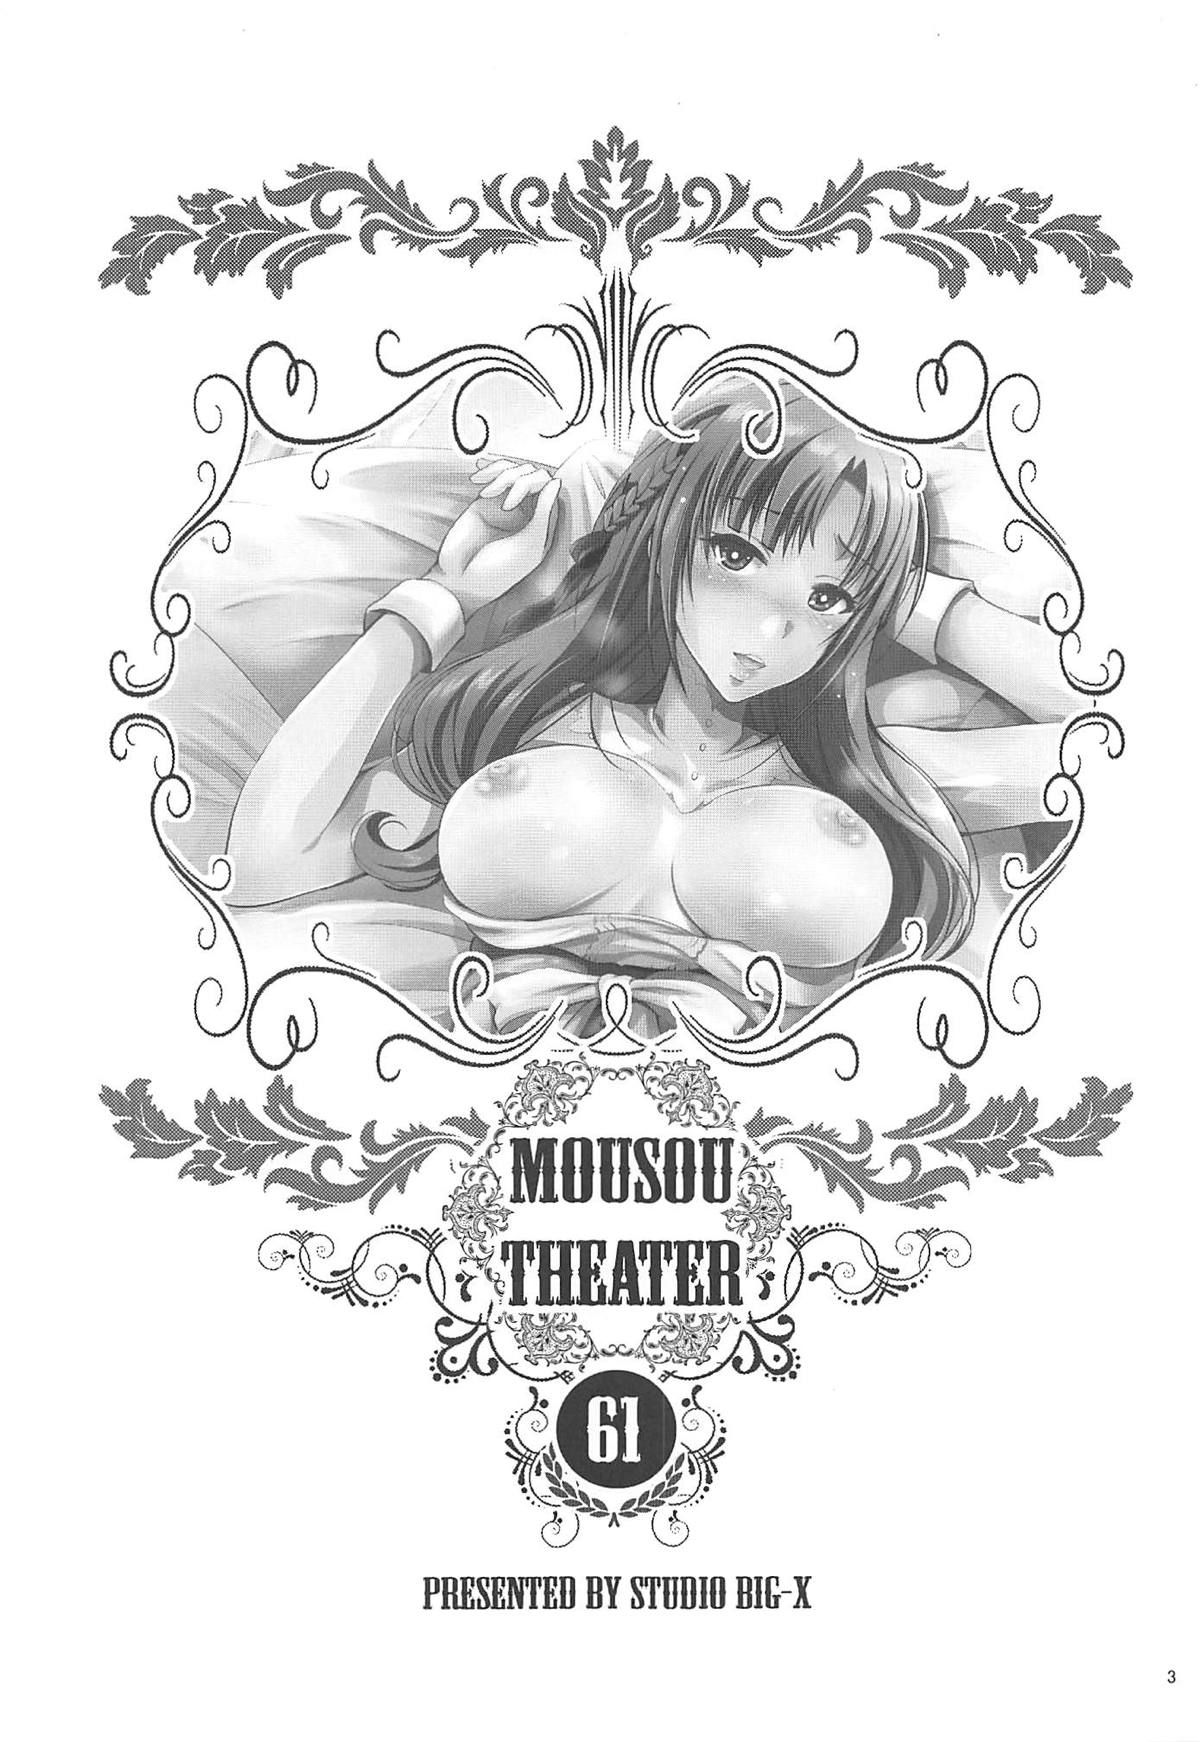 (C96) [スタジオBIG-X (ありのひろし)] MOUSOU THEATER 61 (通常攻撃が全體攻撃で二回攻撃のお母... - 情色卡漫 -